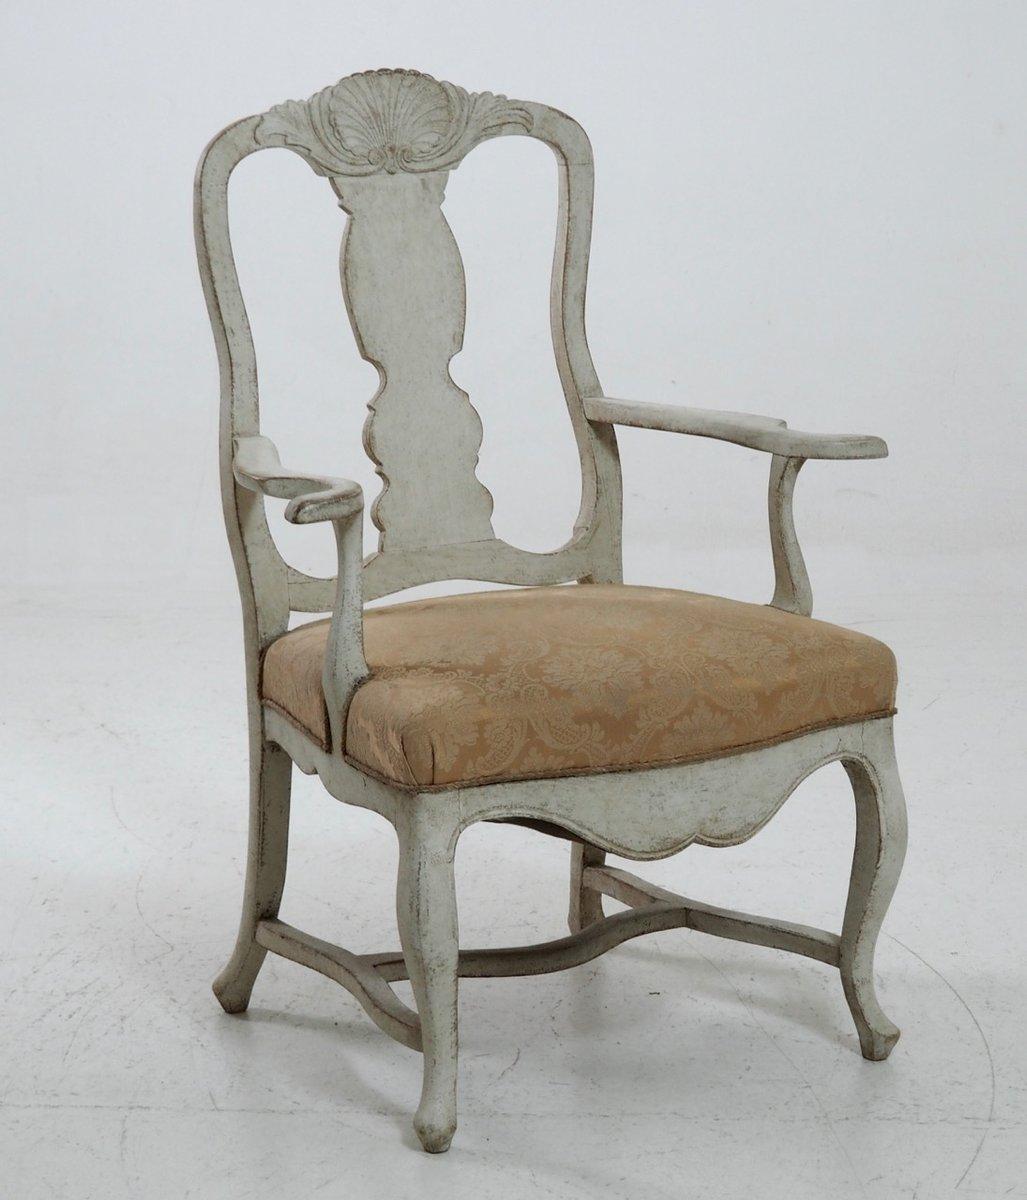 Skandinavischer Sessel antiker skandinavischer sessel im rokoko stil bei pamono kaufen